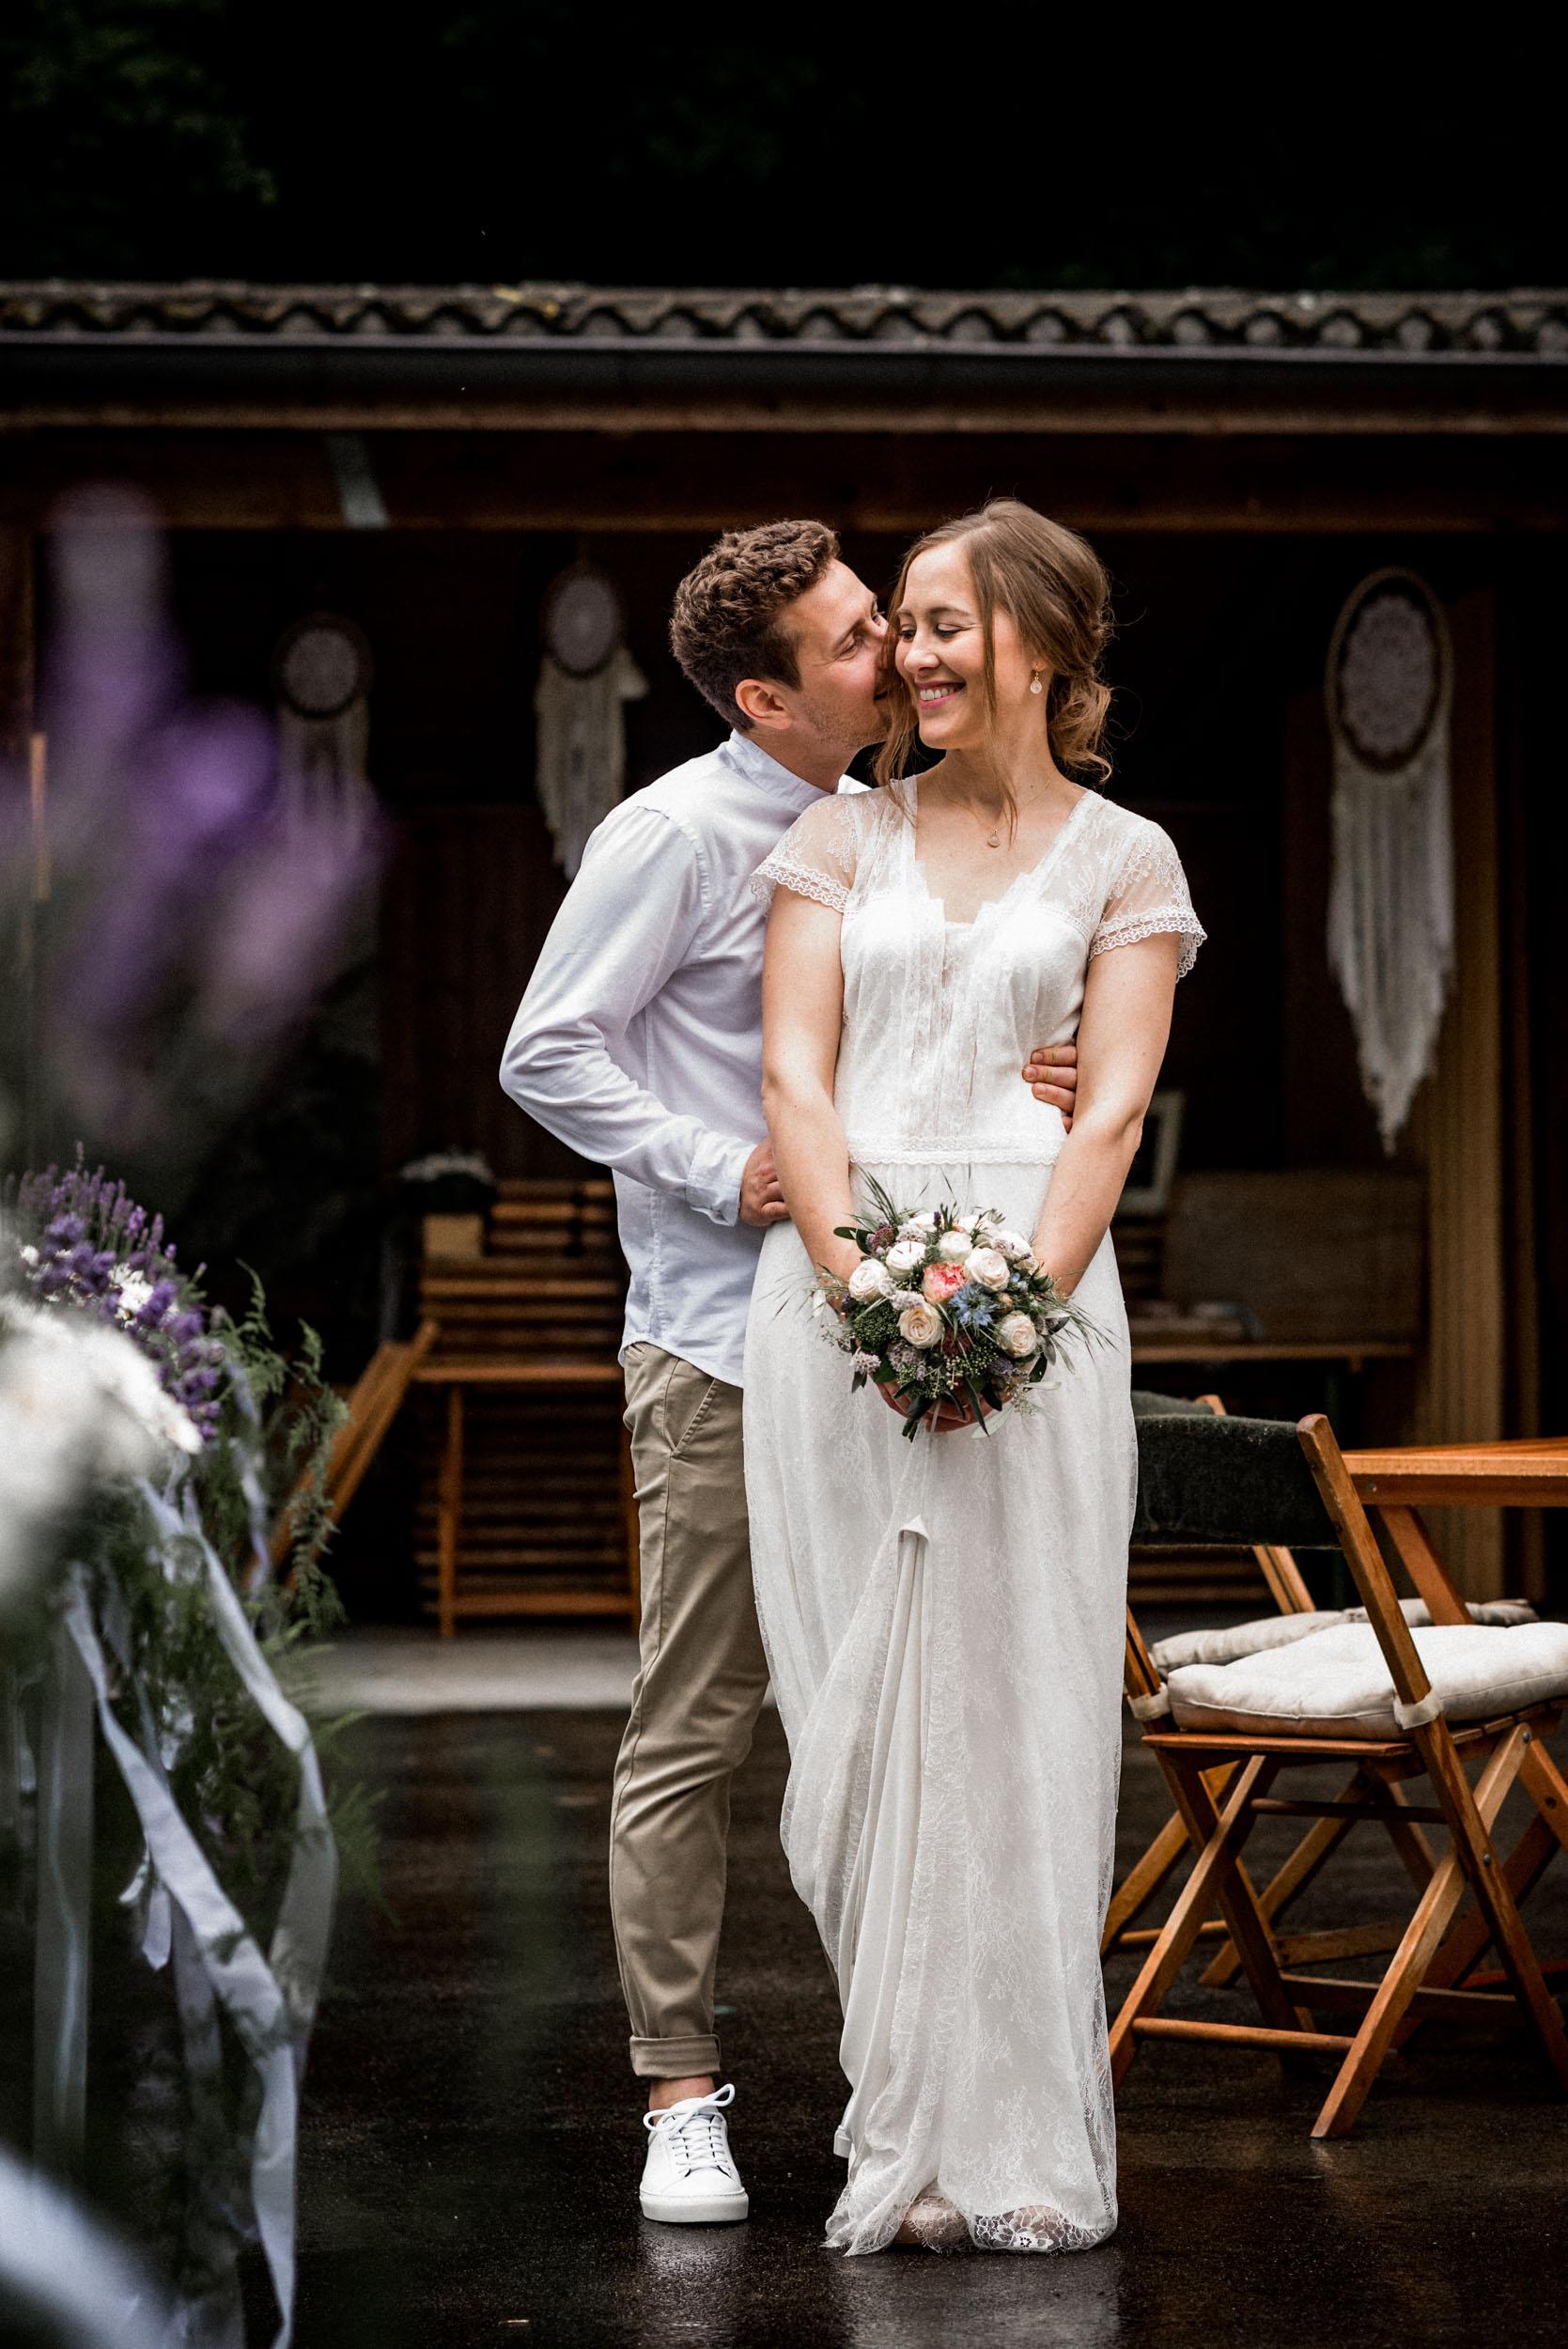 Hochzeitsreportage-Baden-Aargau_2019_5.jpg